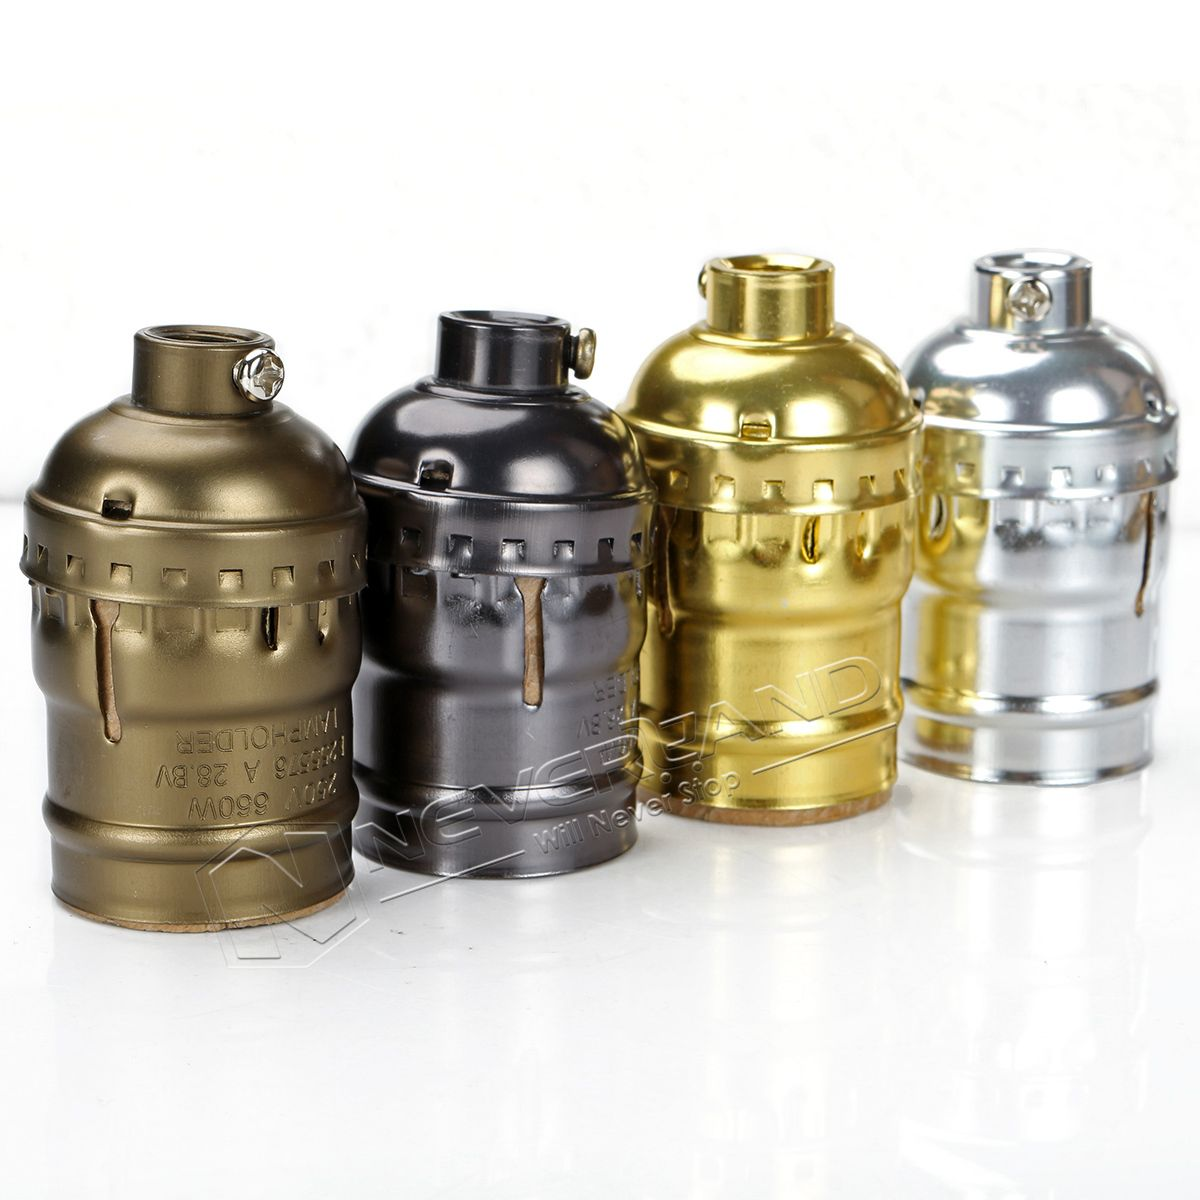 Classic Retro Edison Lamp Holder Socket E27 Bulb Base Pearl Black Antique Brass Gold Silver E27 Ul 110v 220v L Vintage Pendant Lamp Light Accessories Lamp Bulb